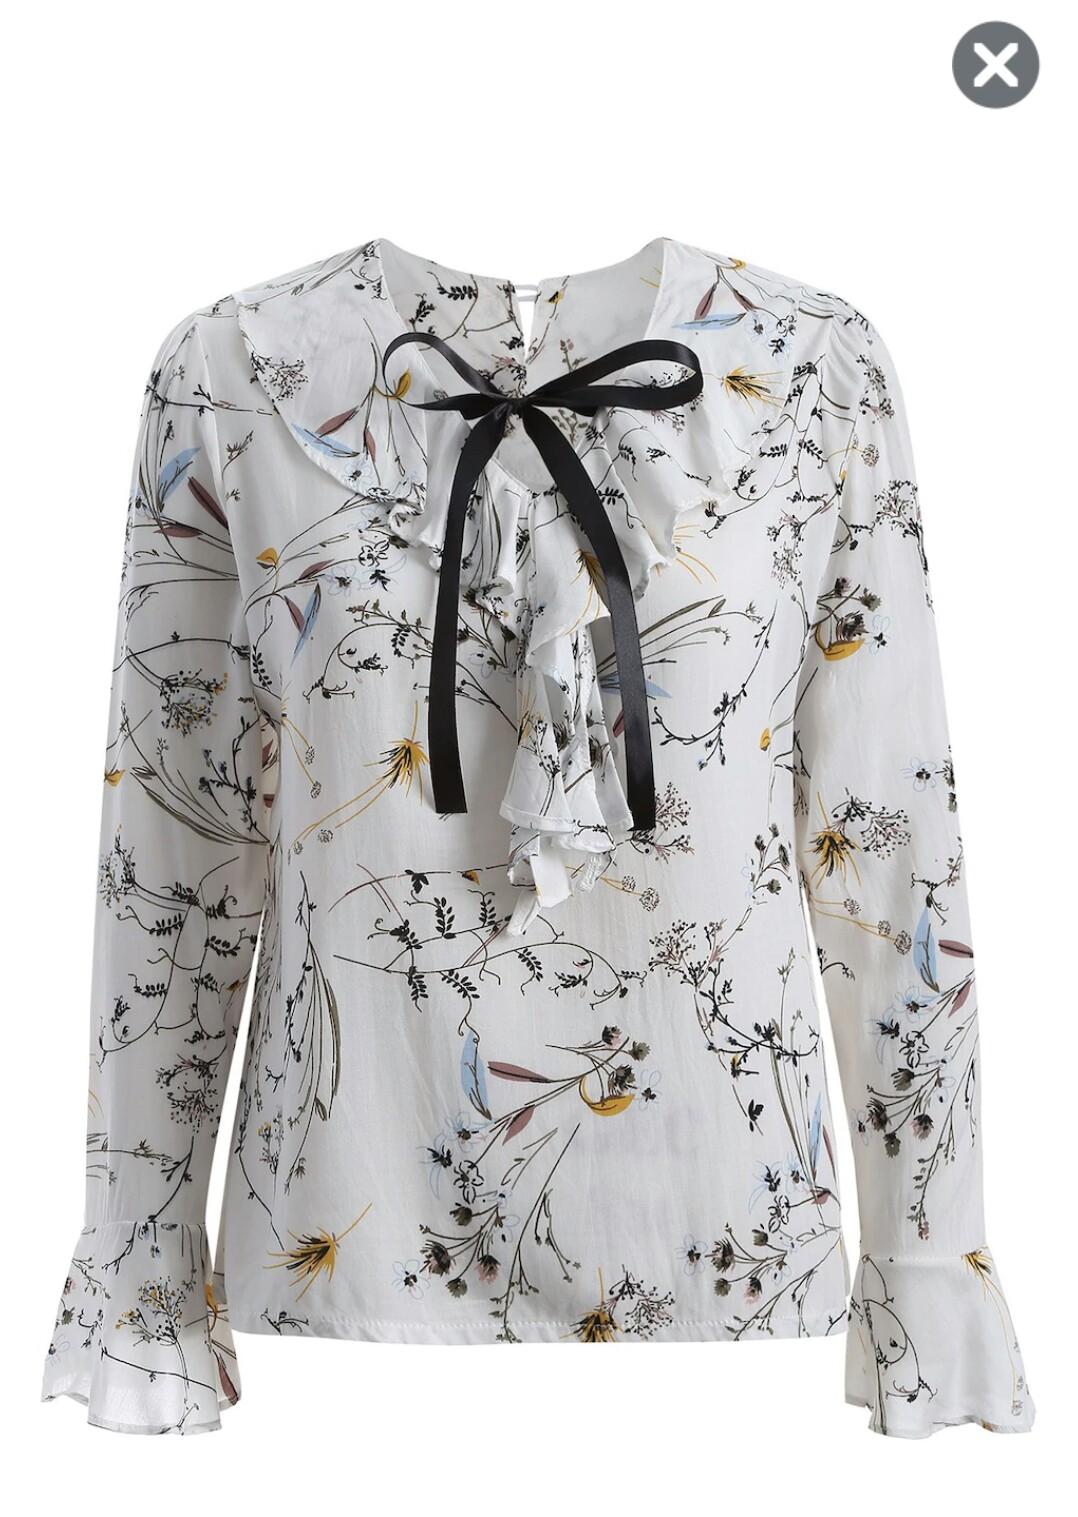 Compras On Line | Loja Rose Gal Moda